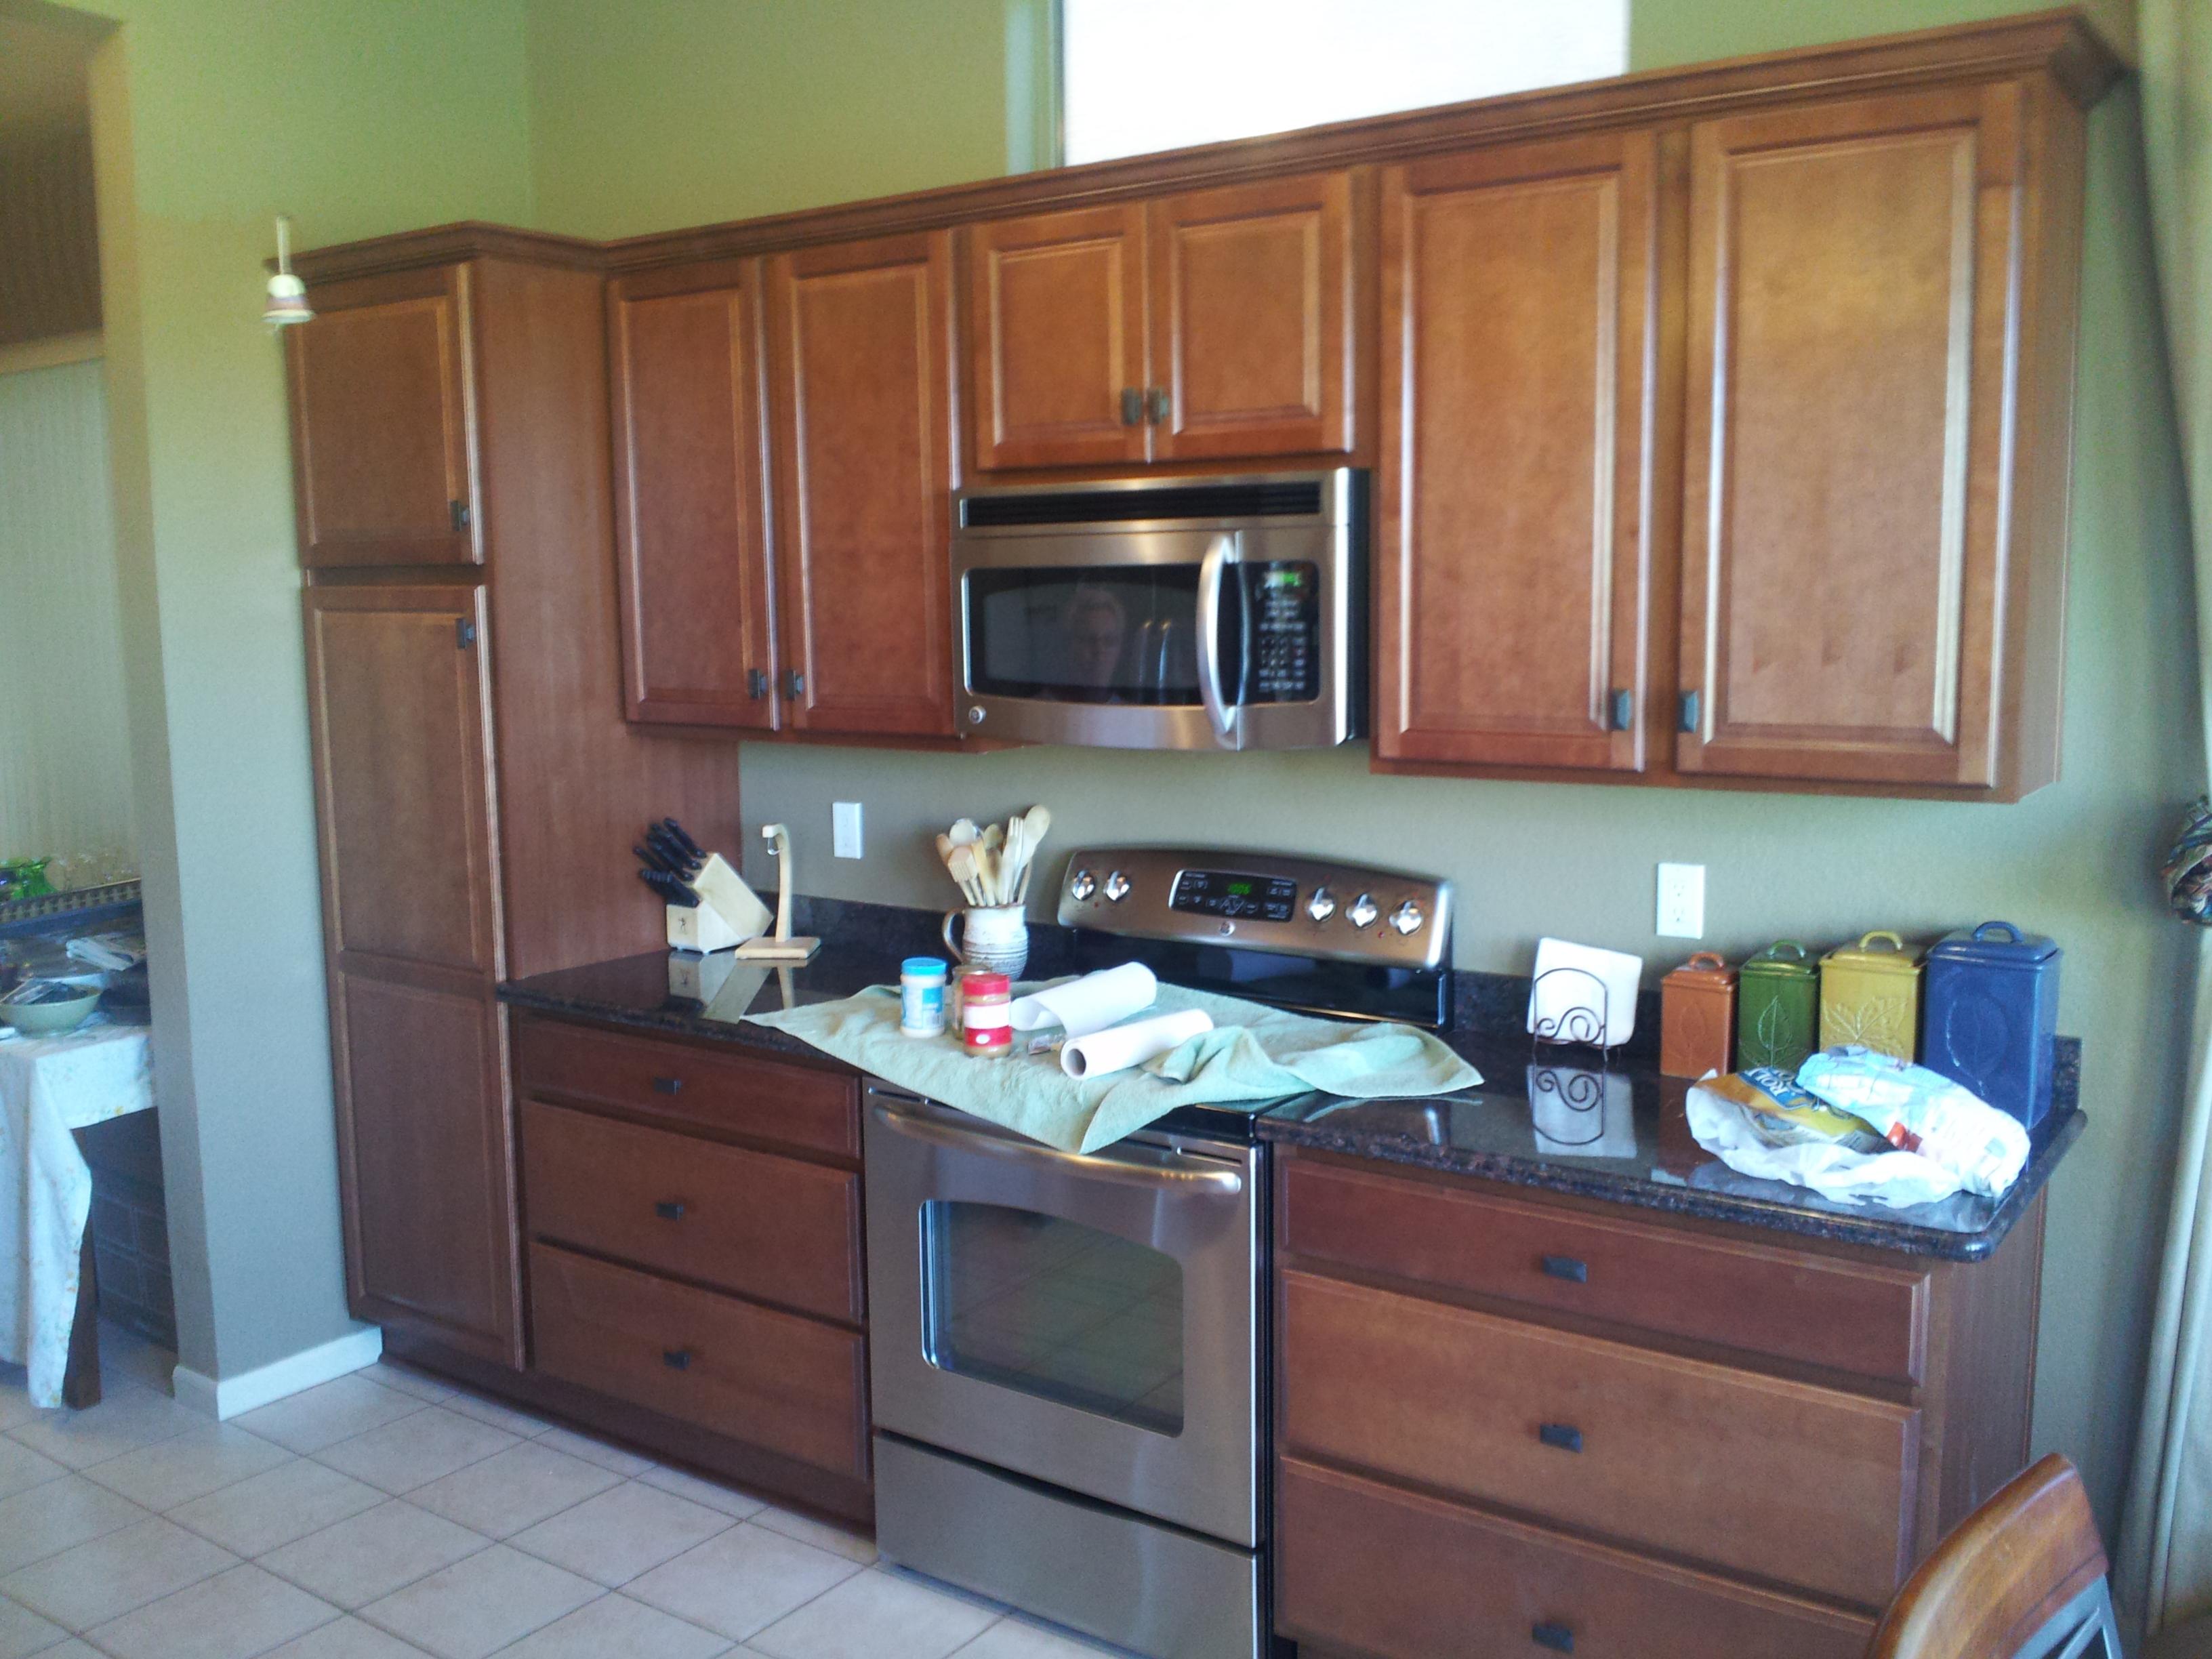 cabinets kitchen remodeling phoenix az Remodeled kitchen Phoenix